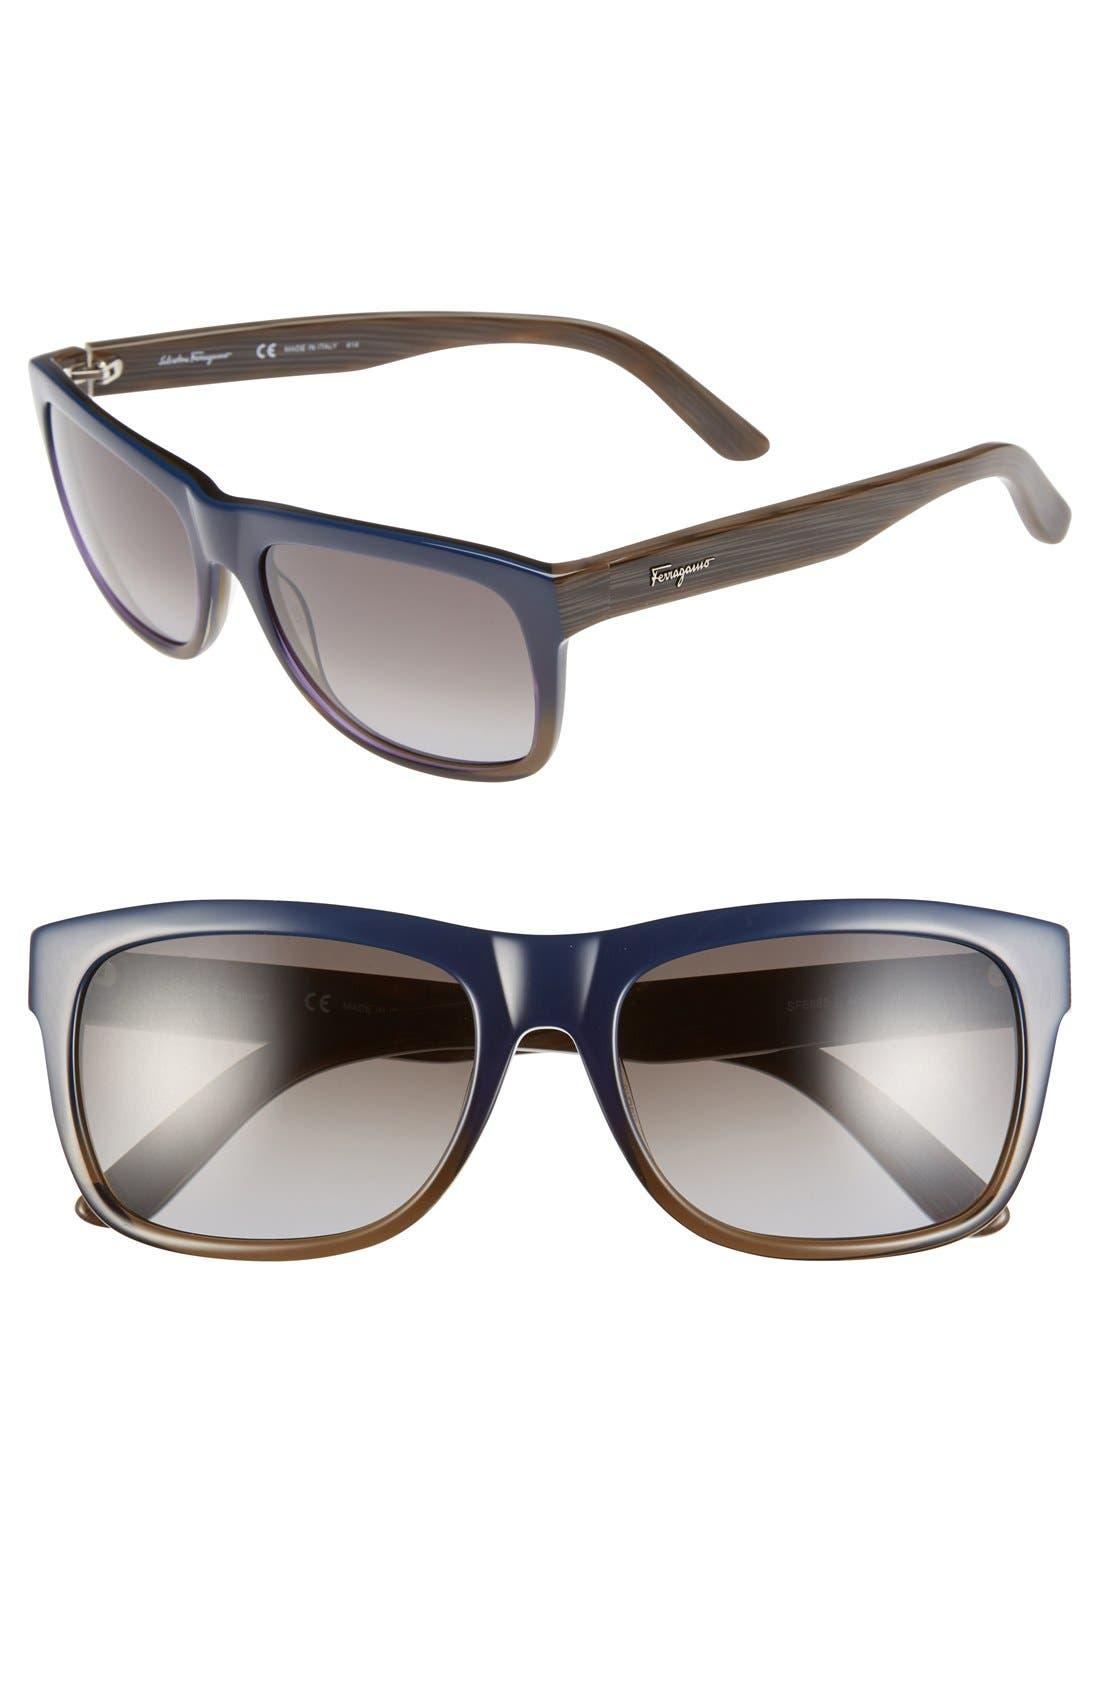 SALVATORE FERRAGAMO 56mm Retro Sunglasses